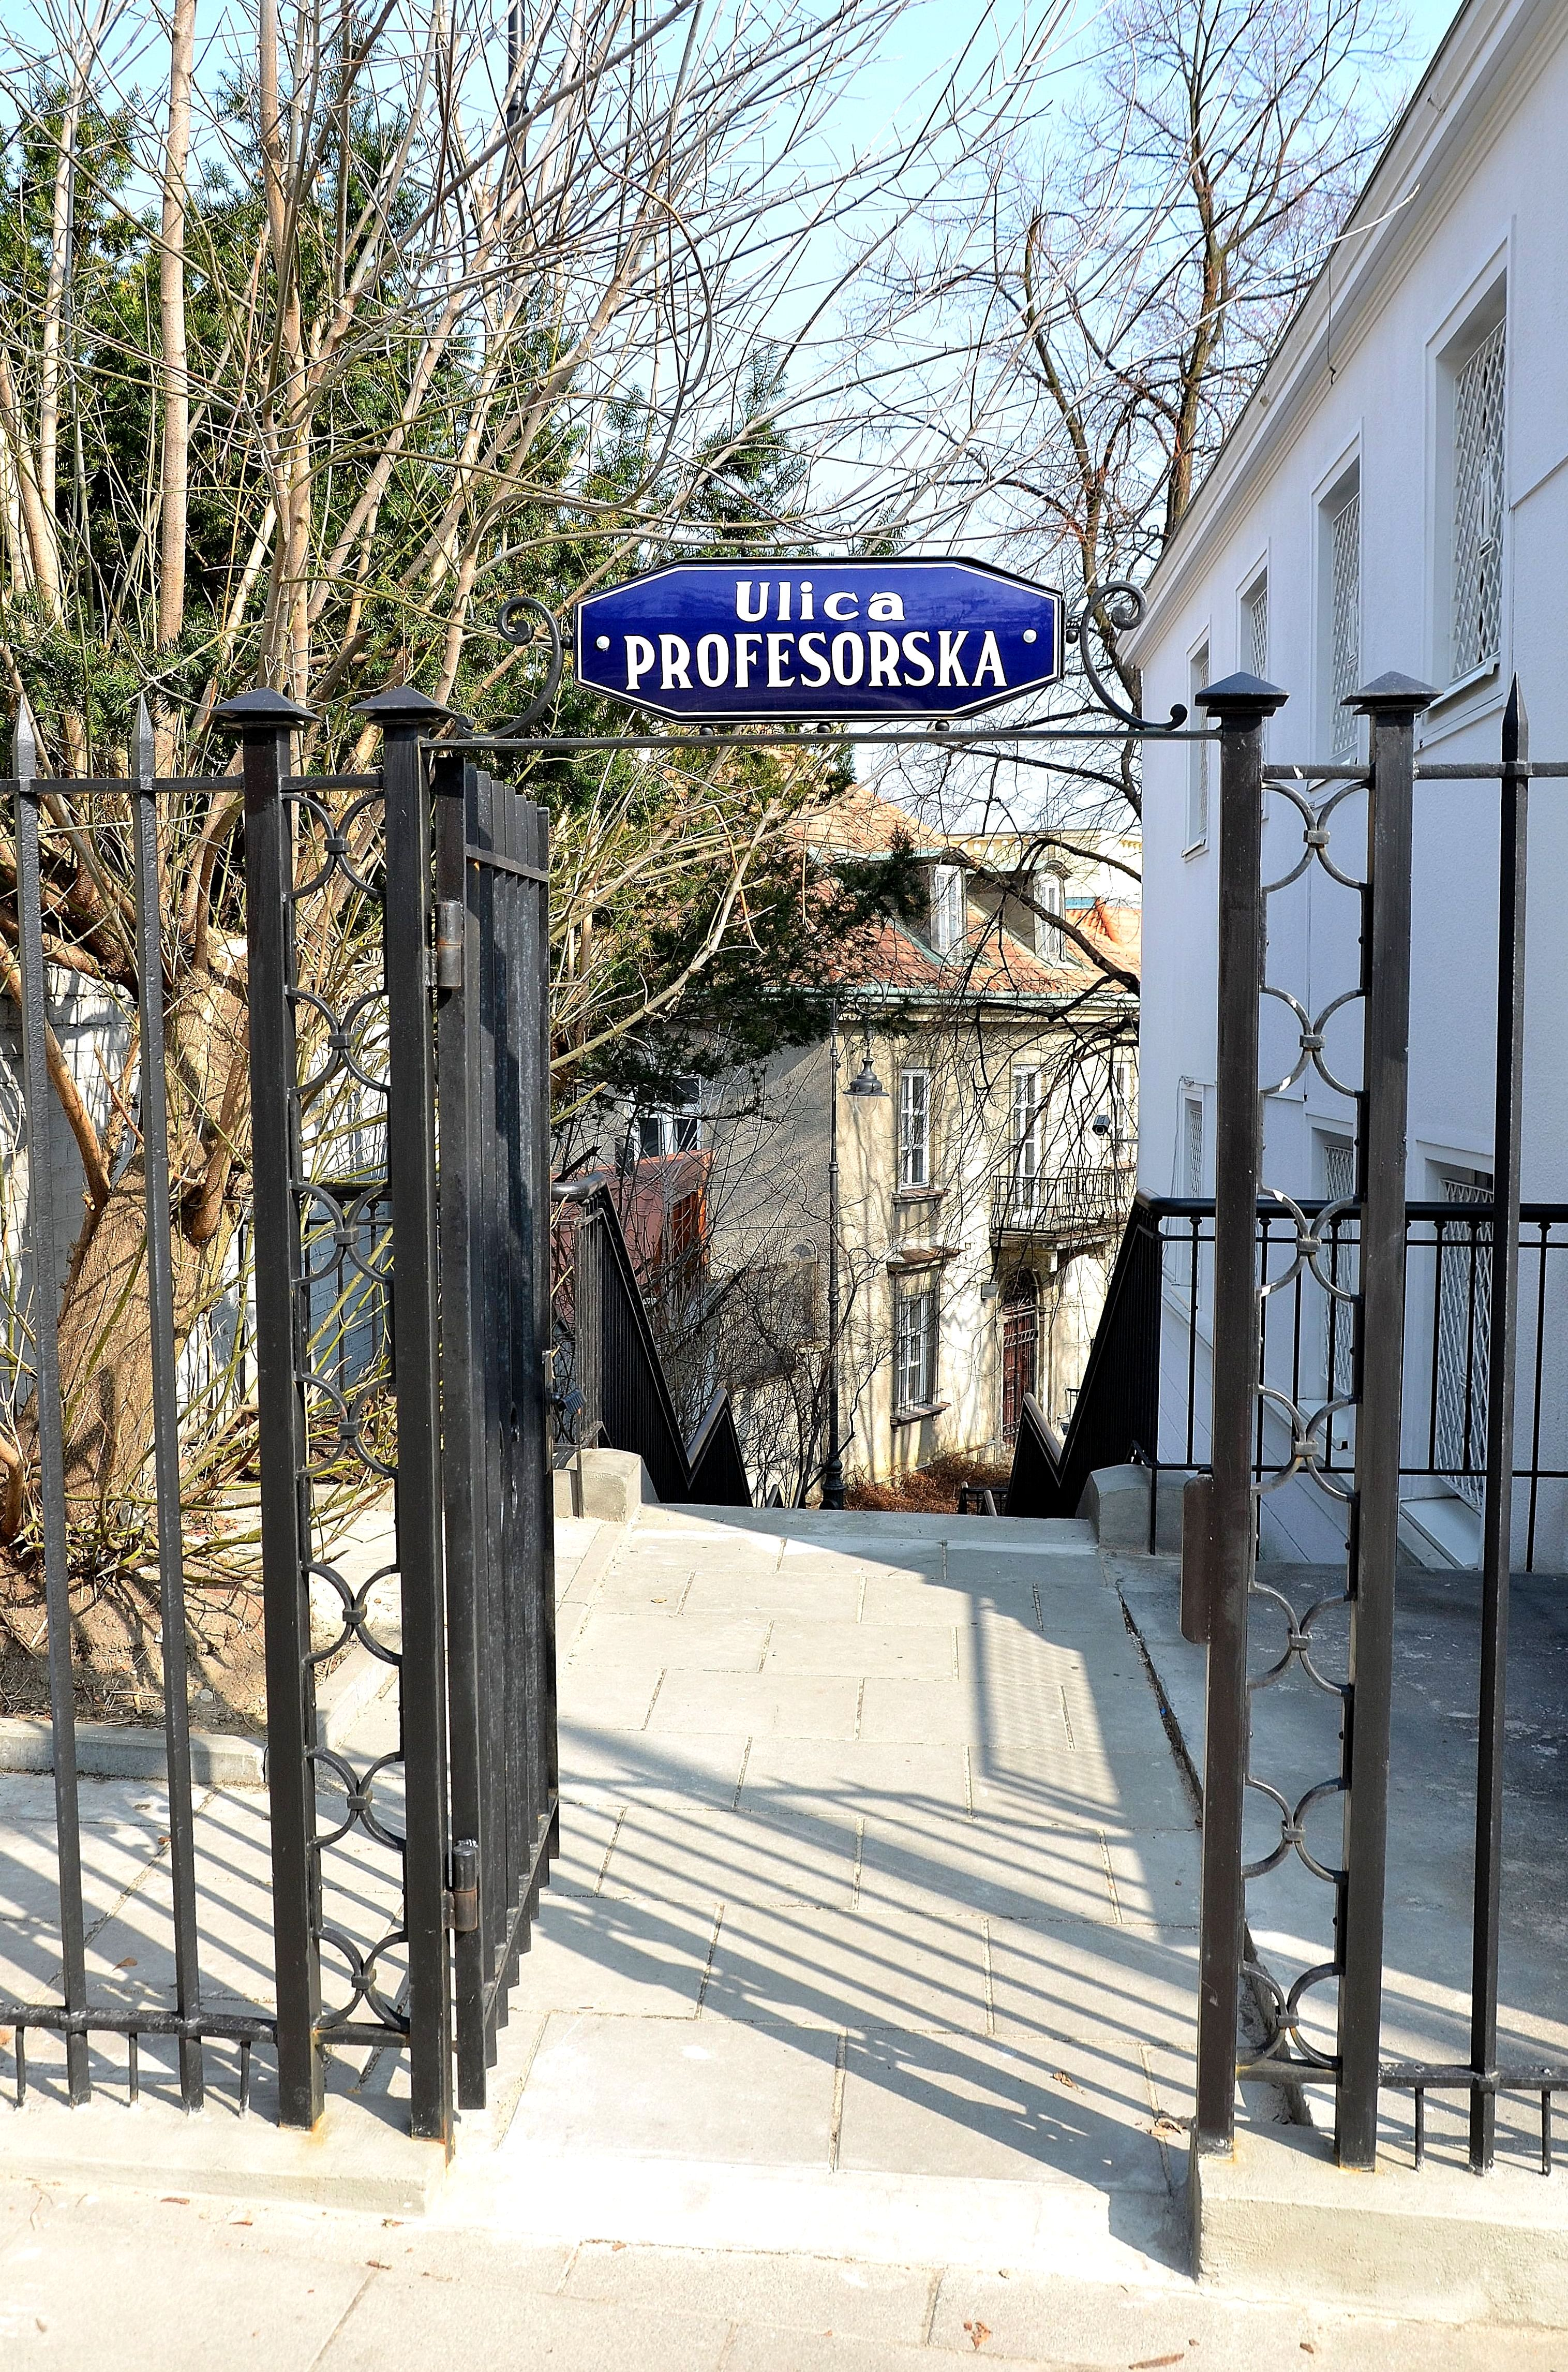 Ulica Profesorska w Warszawie 02 (1)